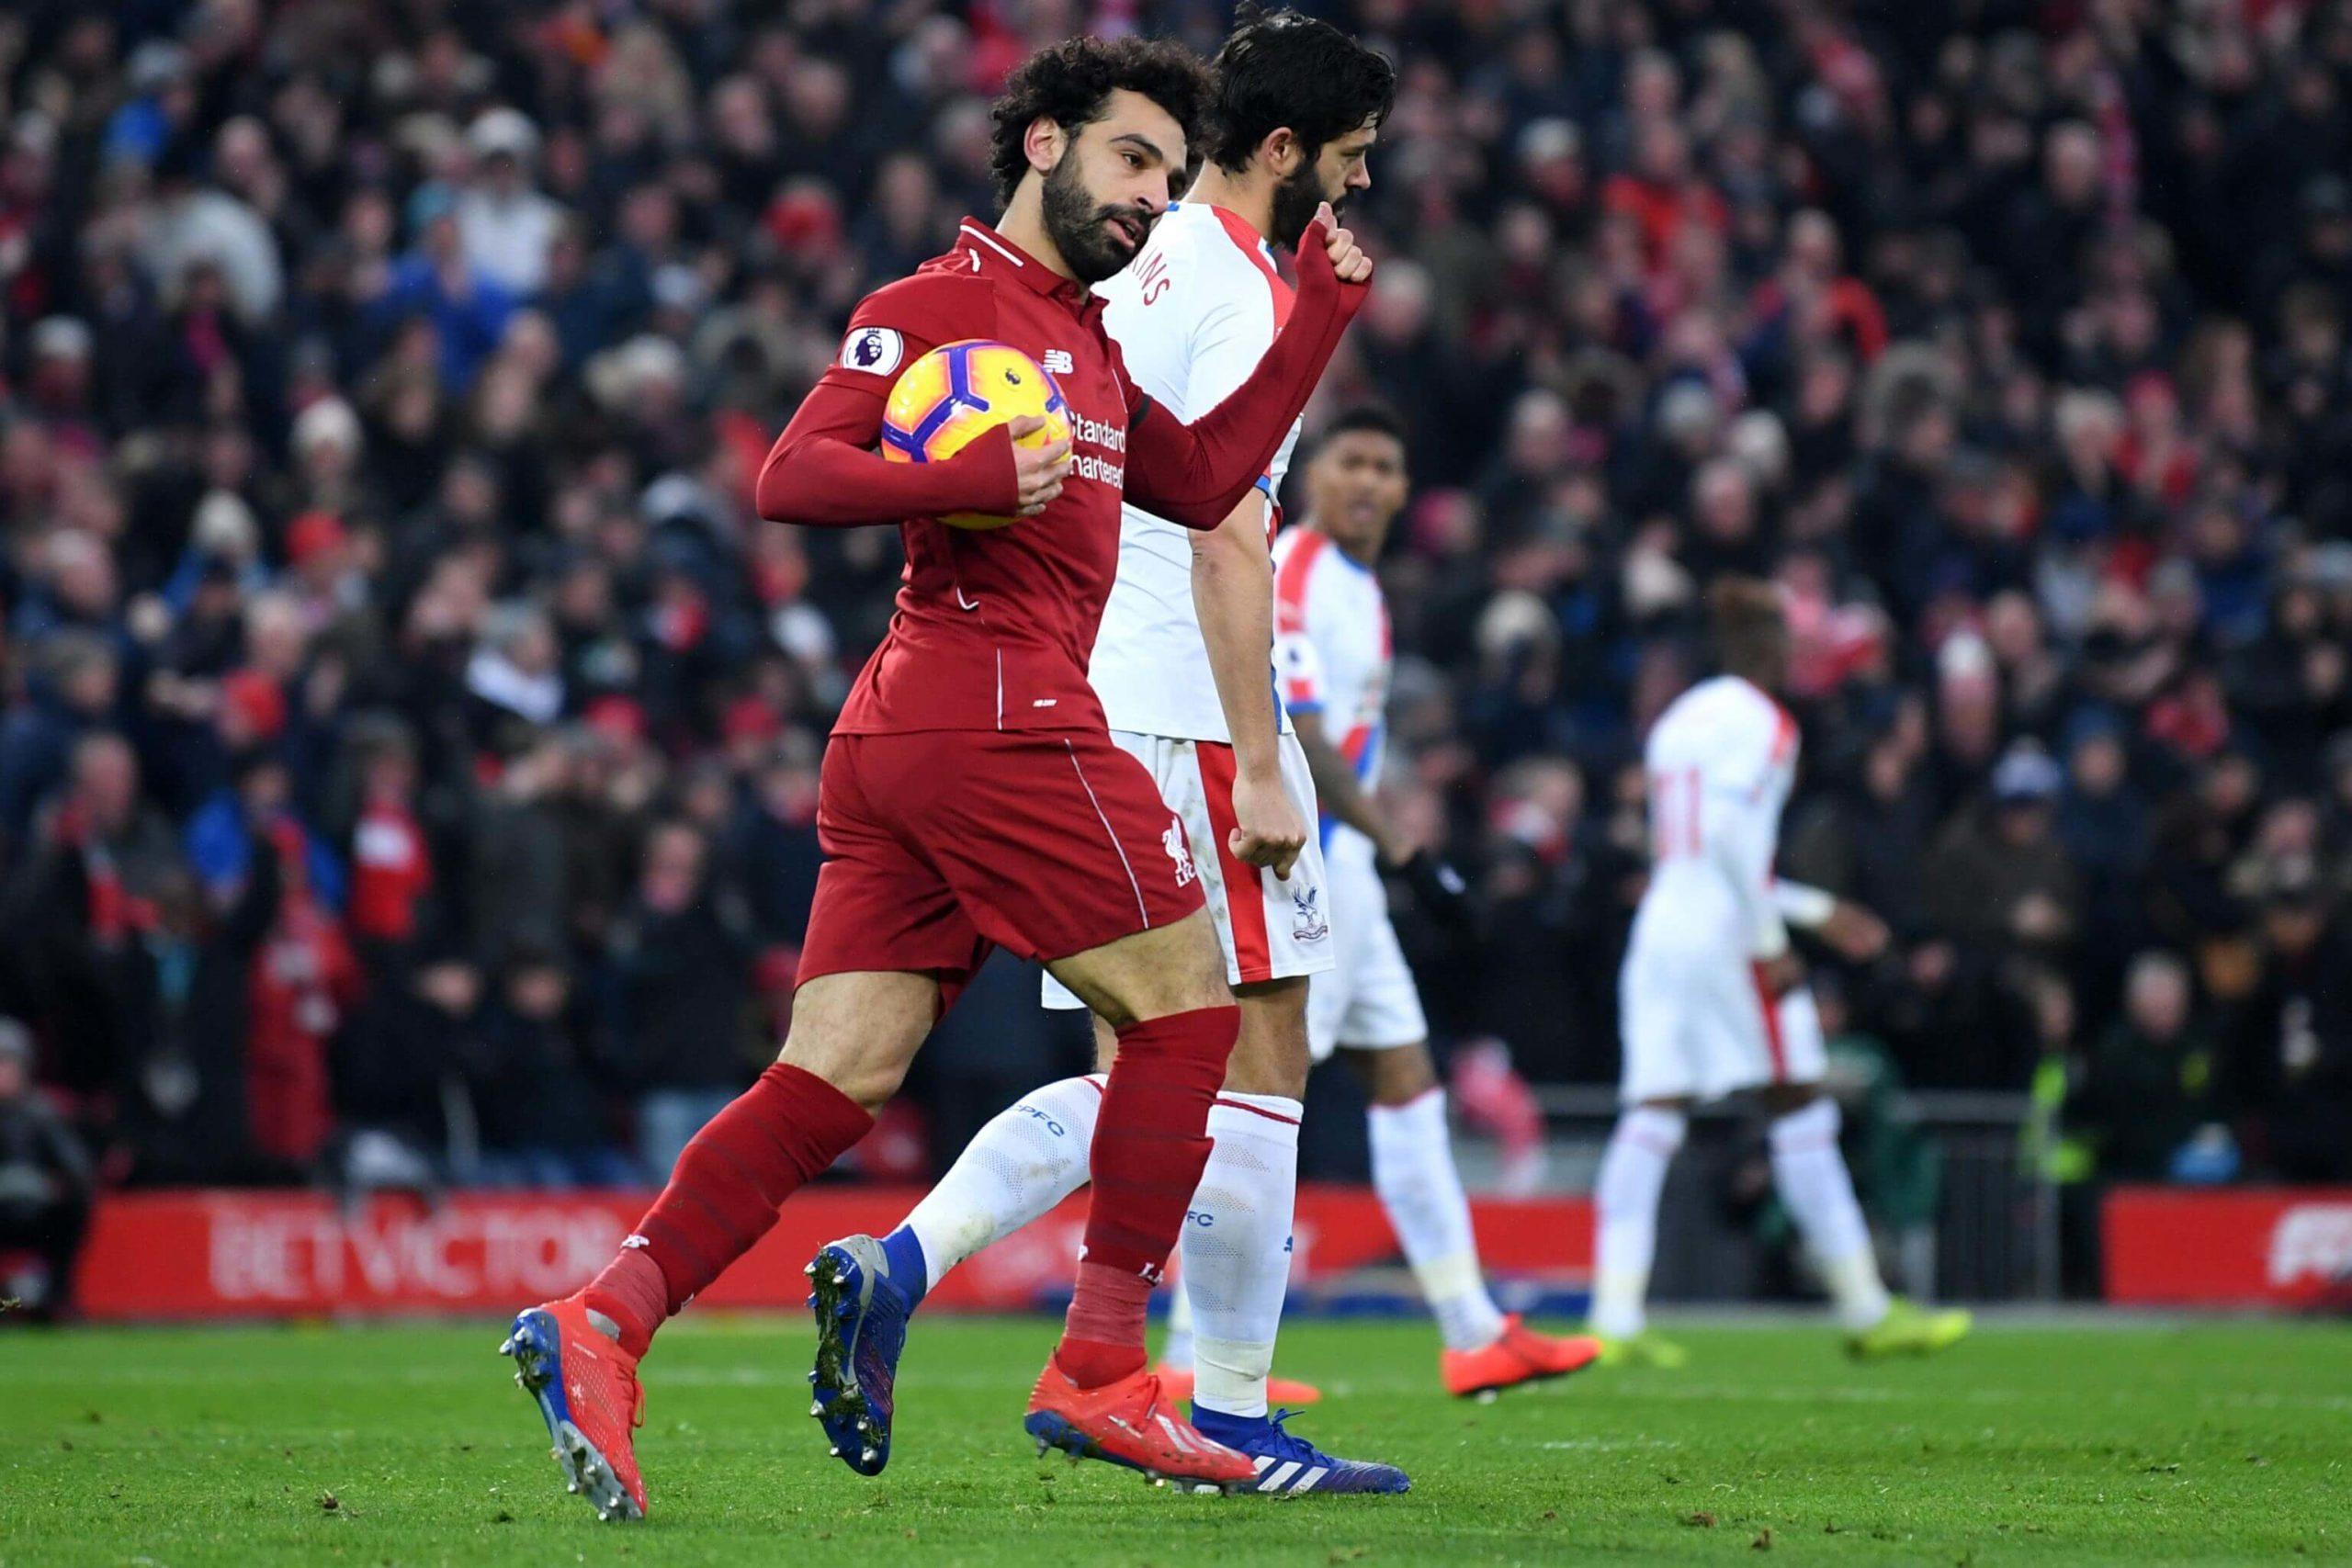 Mohamed-Salah-scorer-with-Liverpool-against-Crystal-Palace_24hfootnews.com_mo-salah